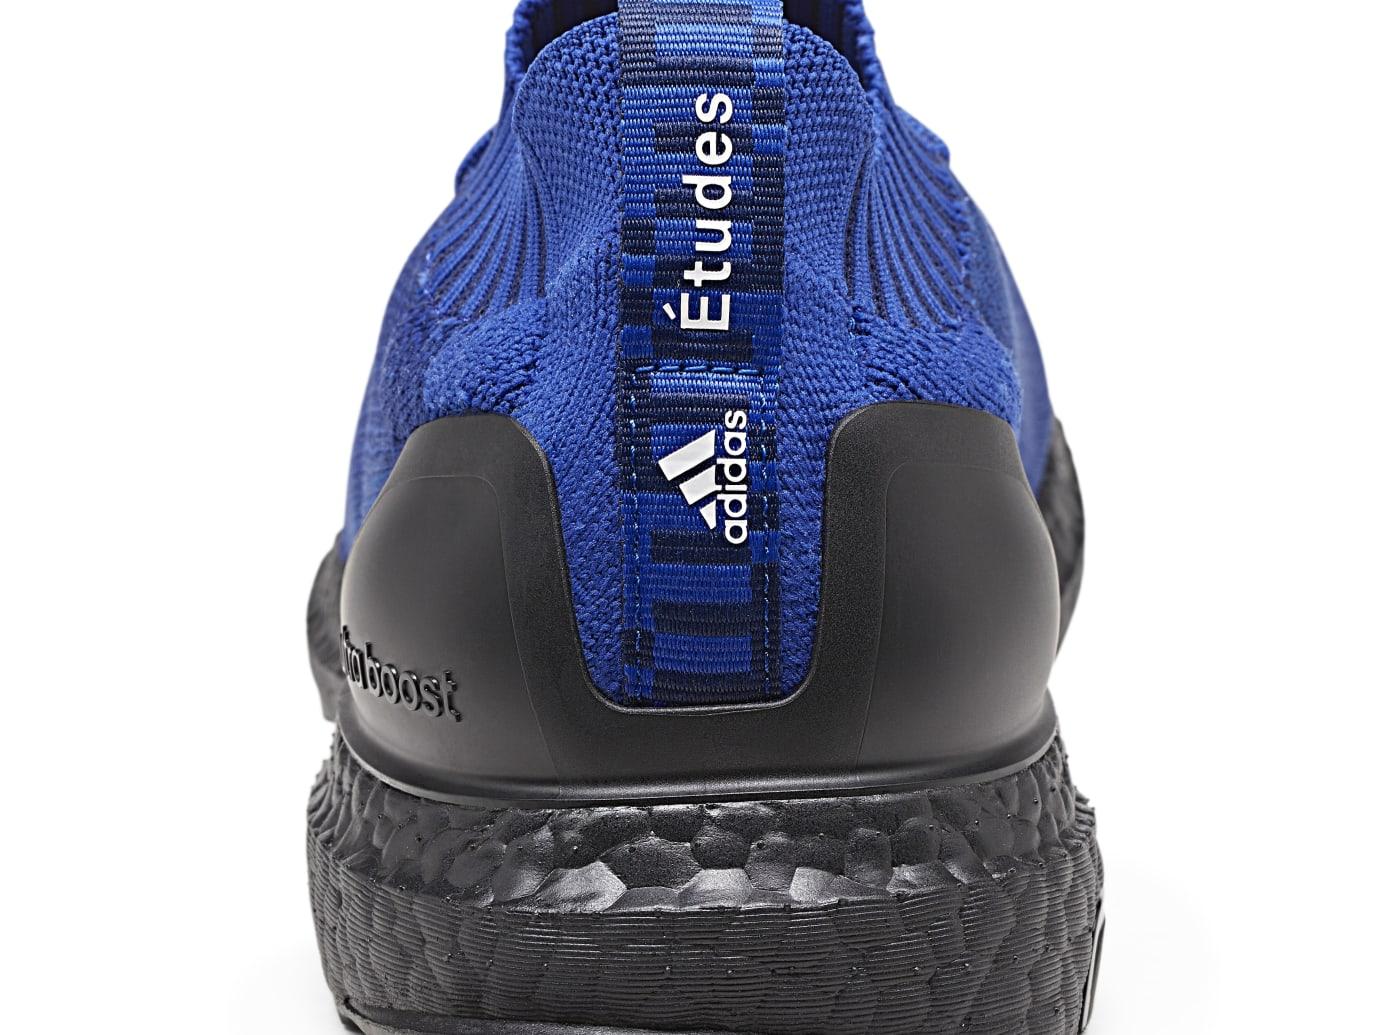 Image via Adidas Études x Adidas Consortium Ultra Boost Uncaged D97732  (Heel) 588a36ccdb34